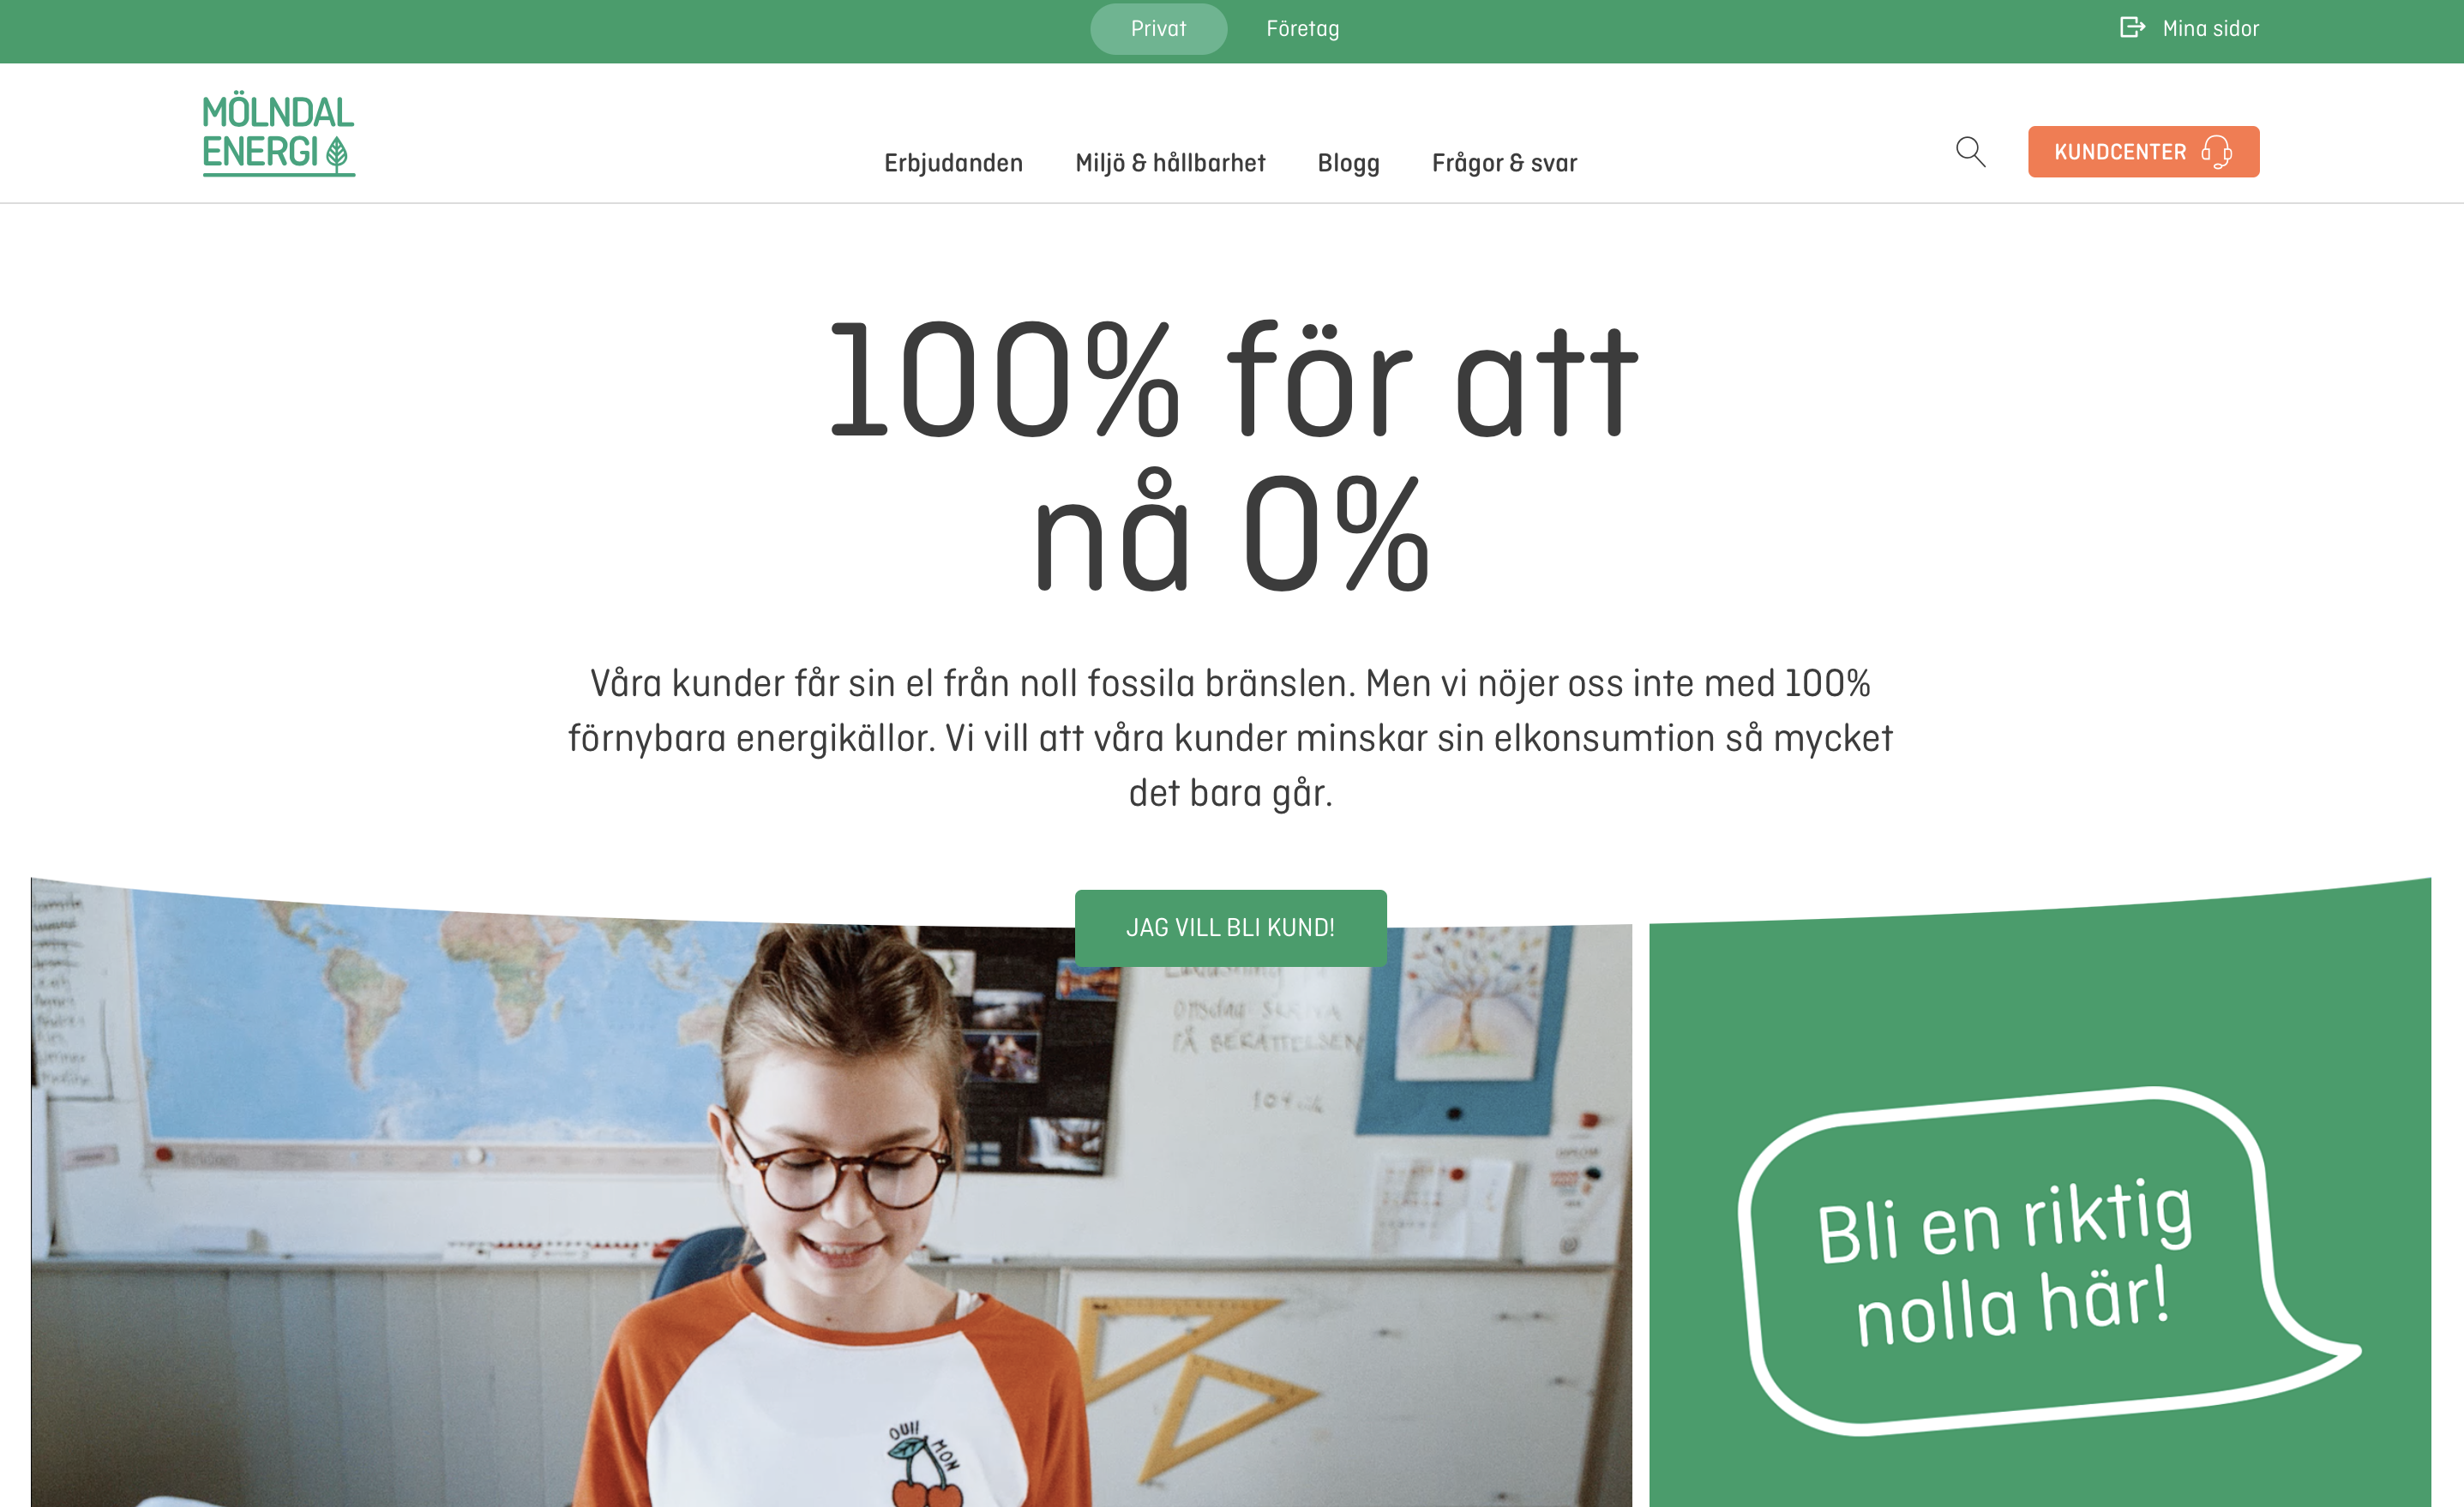 Mölndal won Sveriges Bästa Branschblogg 2020